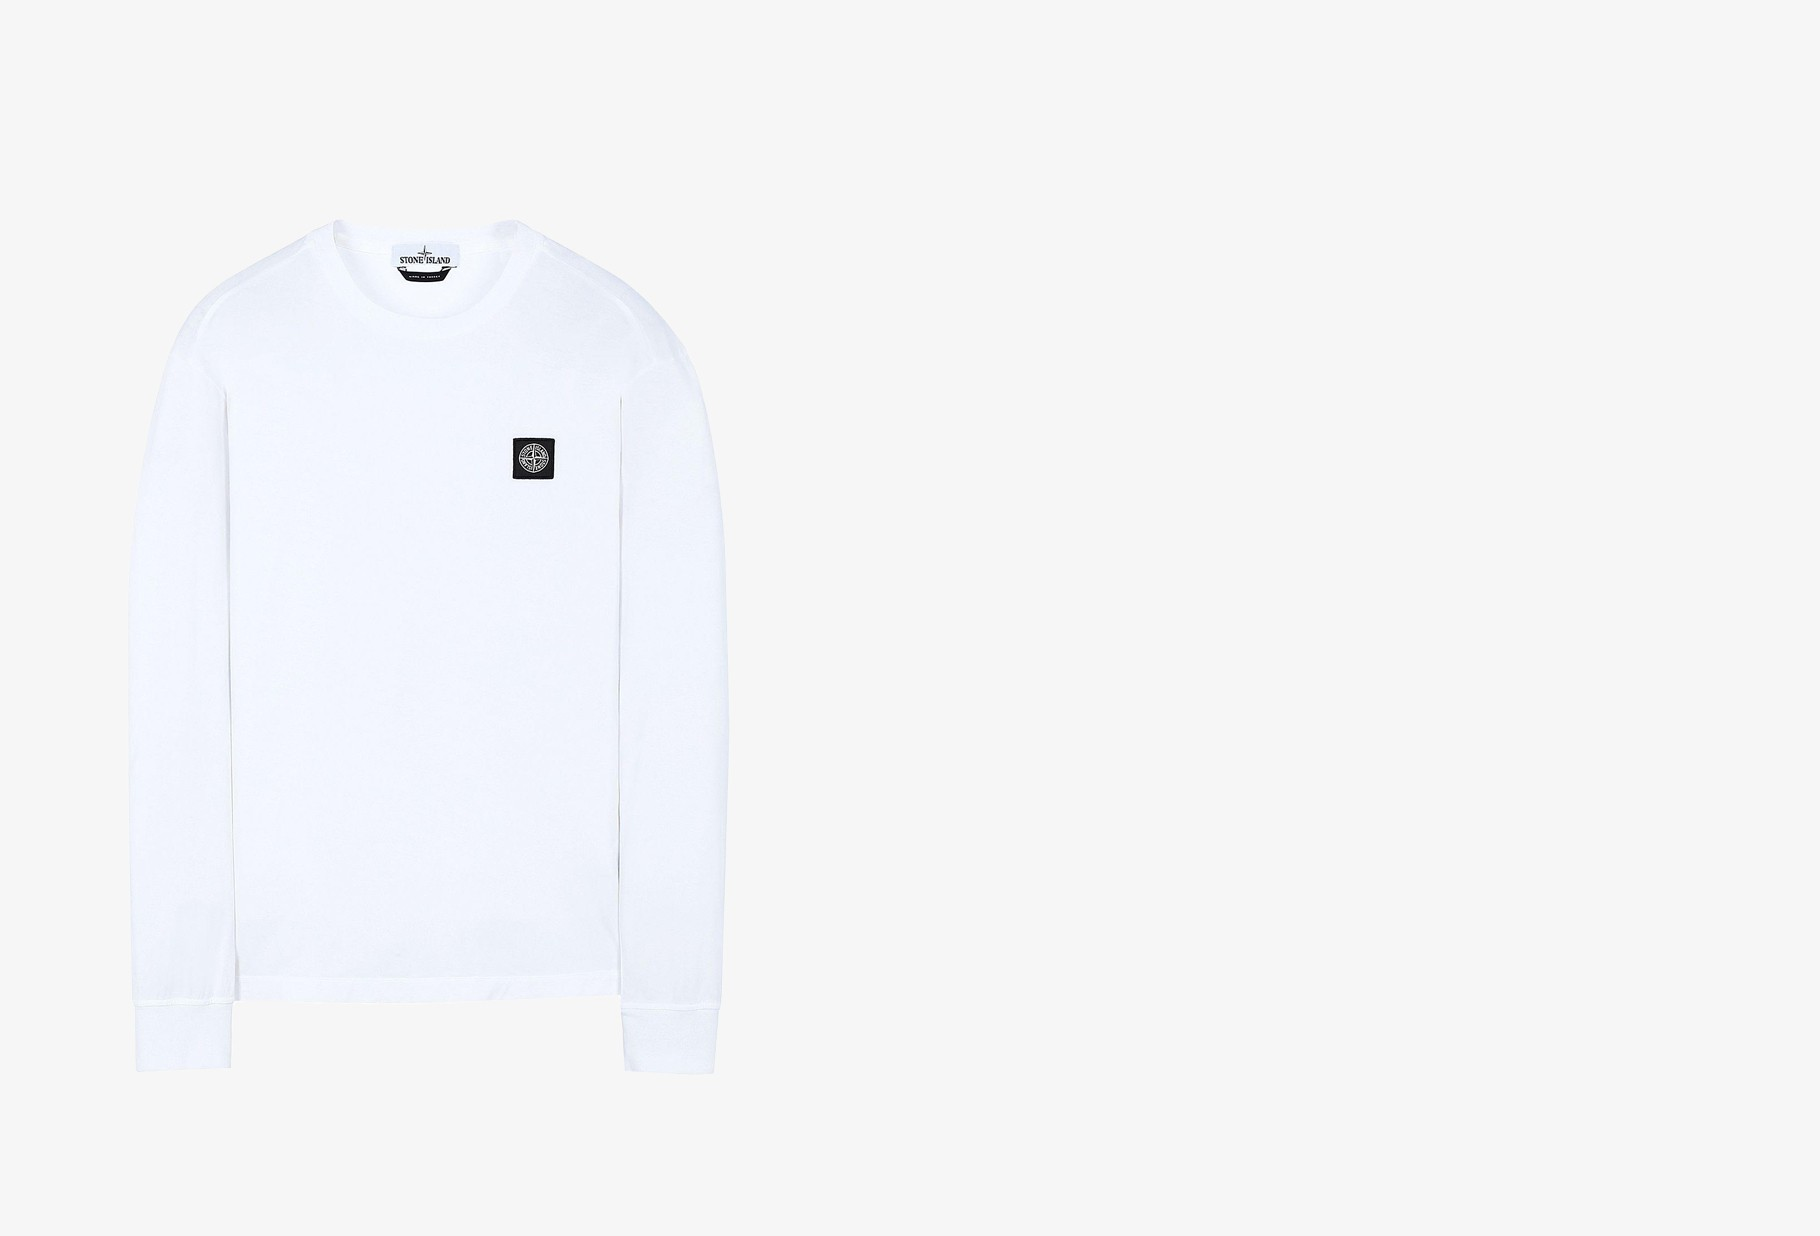 STONE ISLAND / 22713 ls t shirt v0093 Avorio